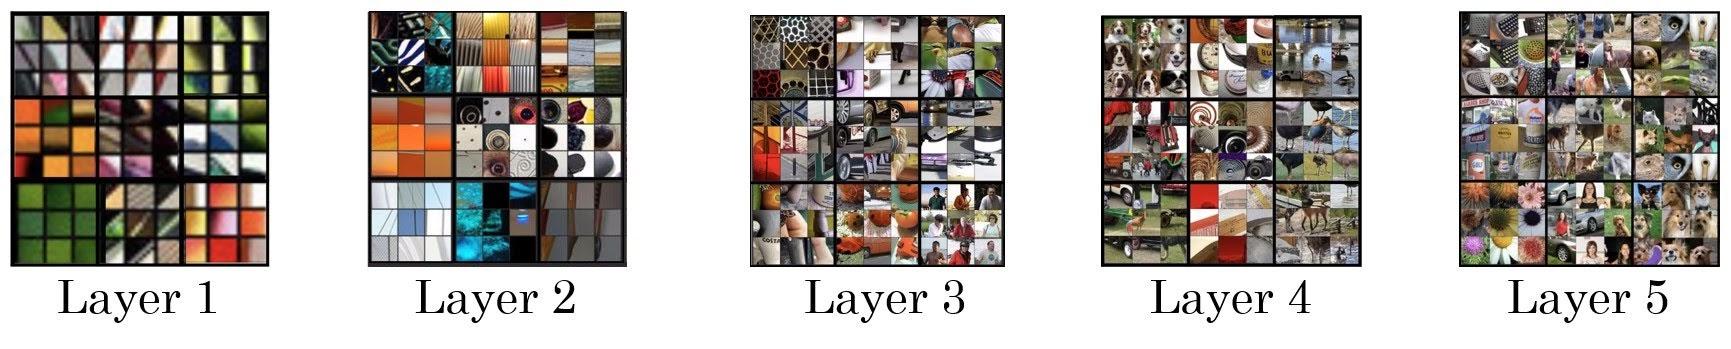 convnet layers